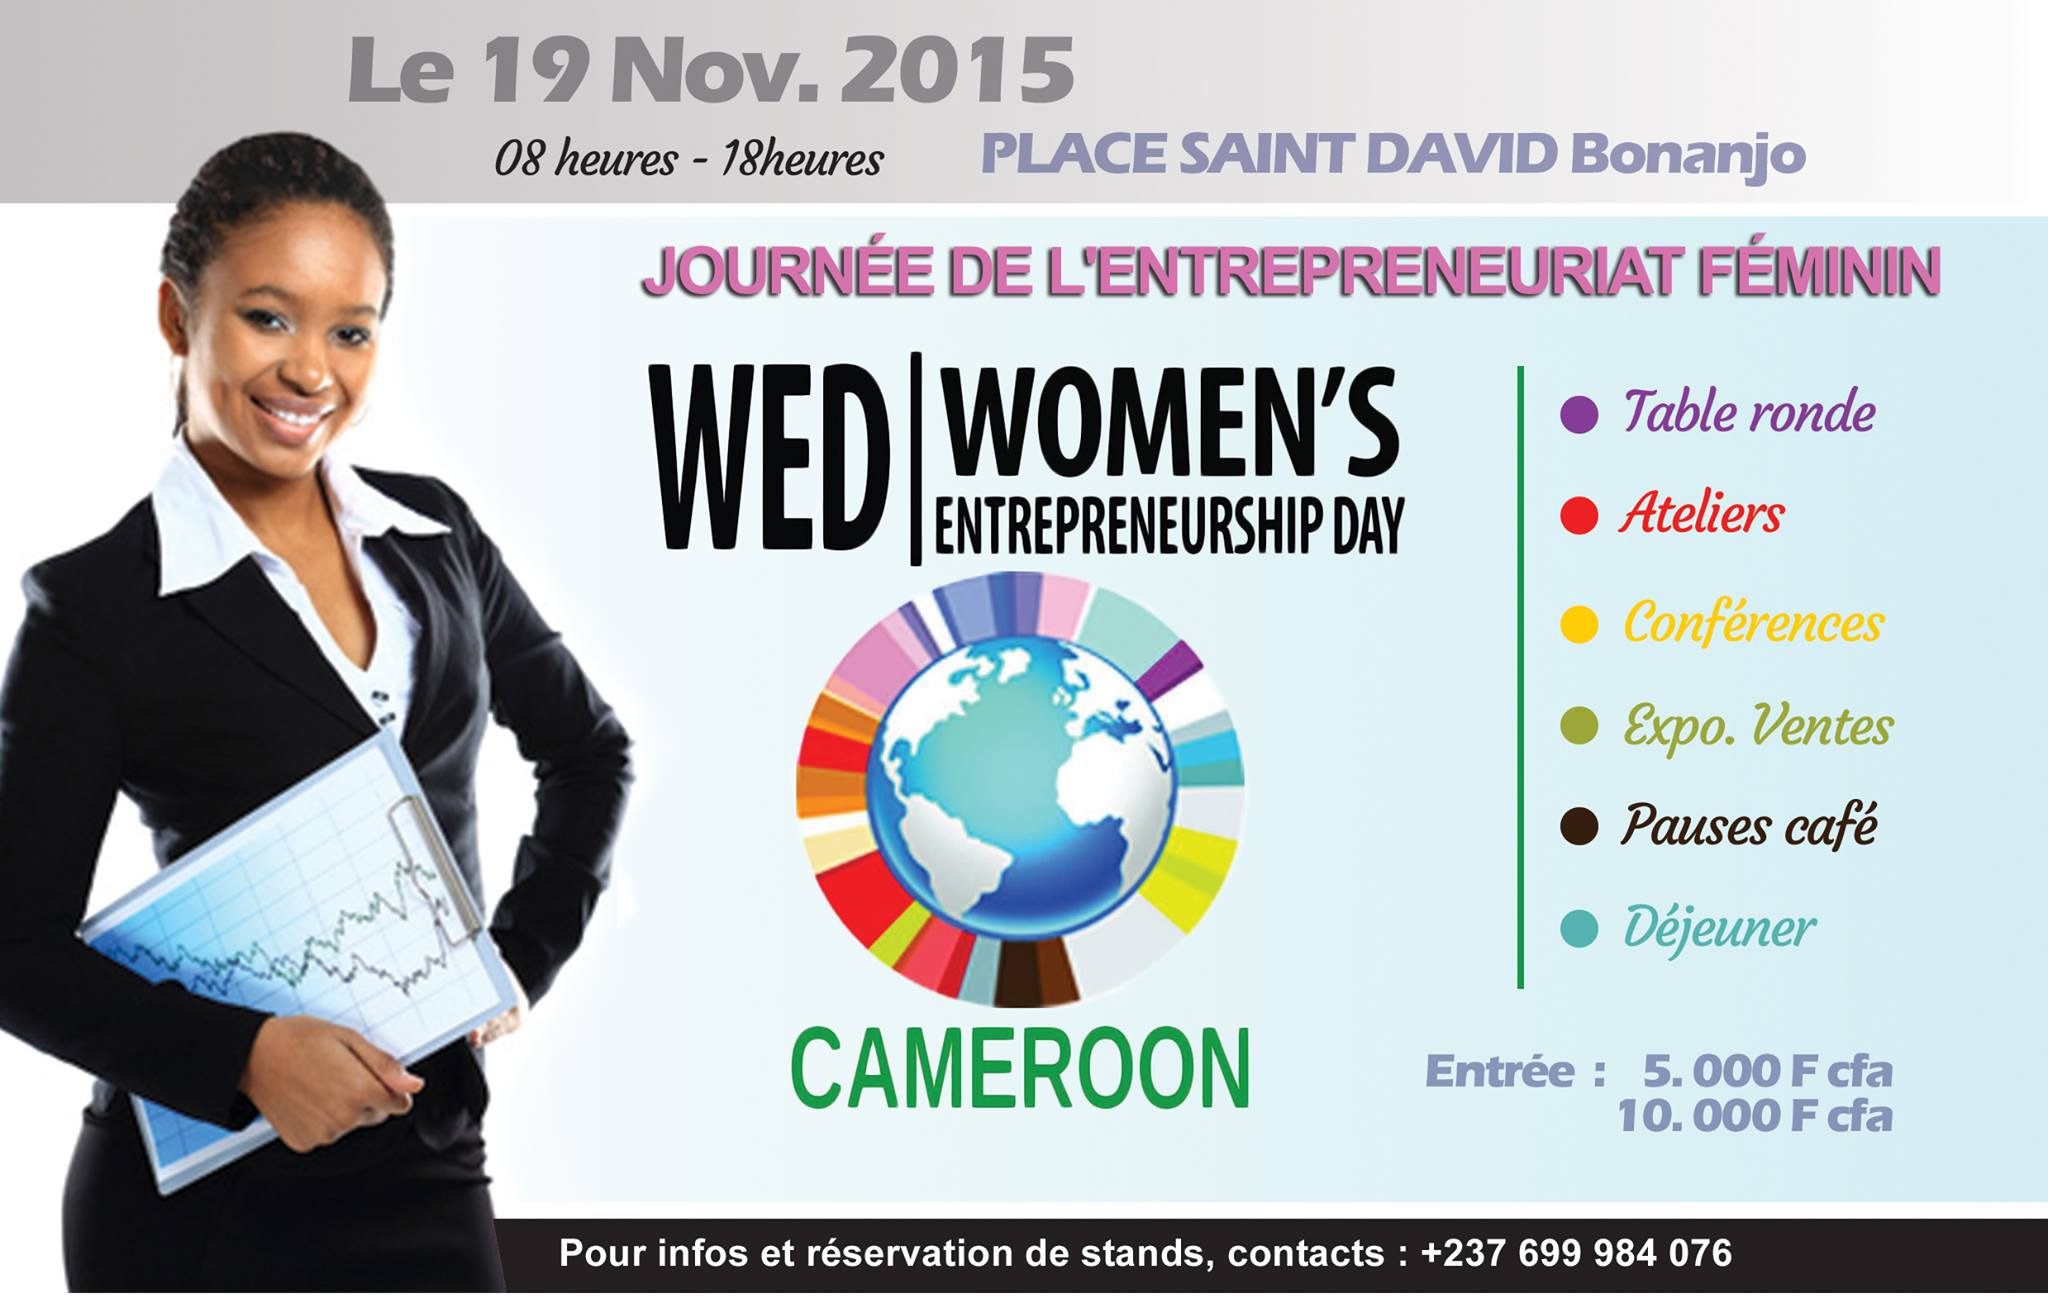 Les Marches d'Elodie - WED 2015 - Women Entrepreneurship Day